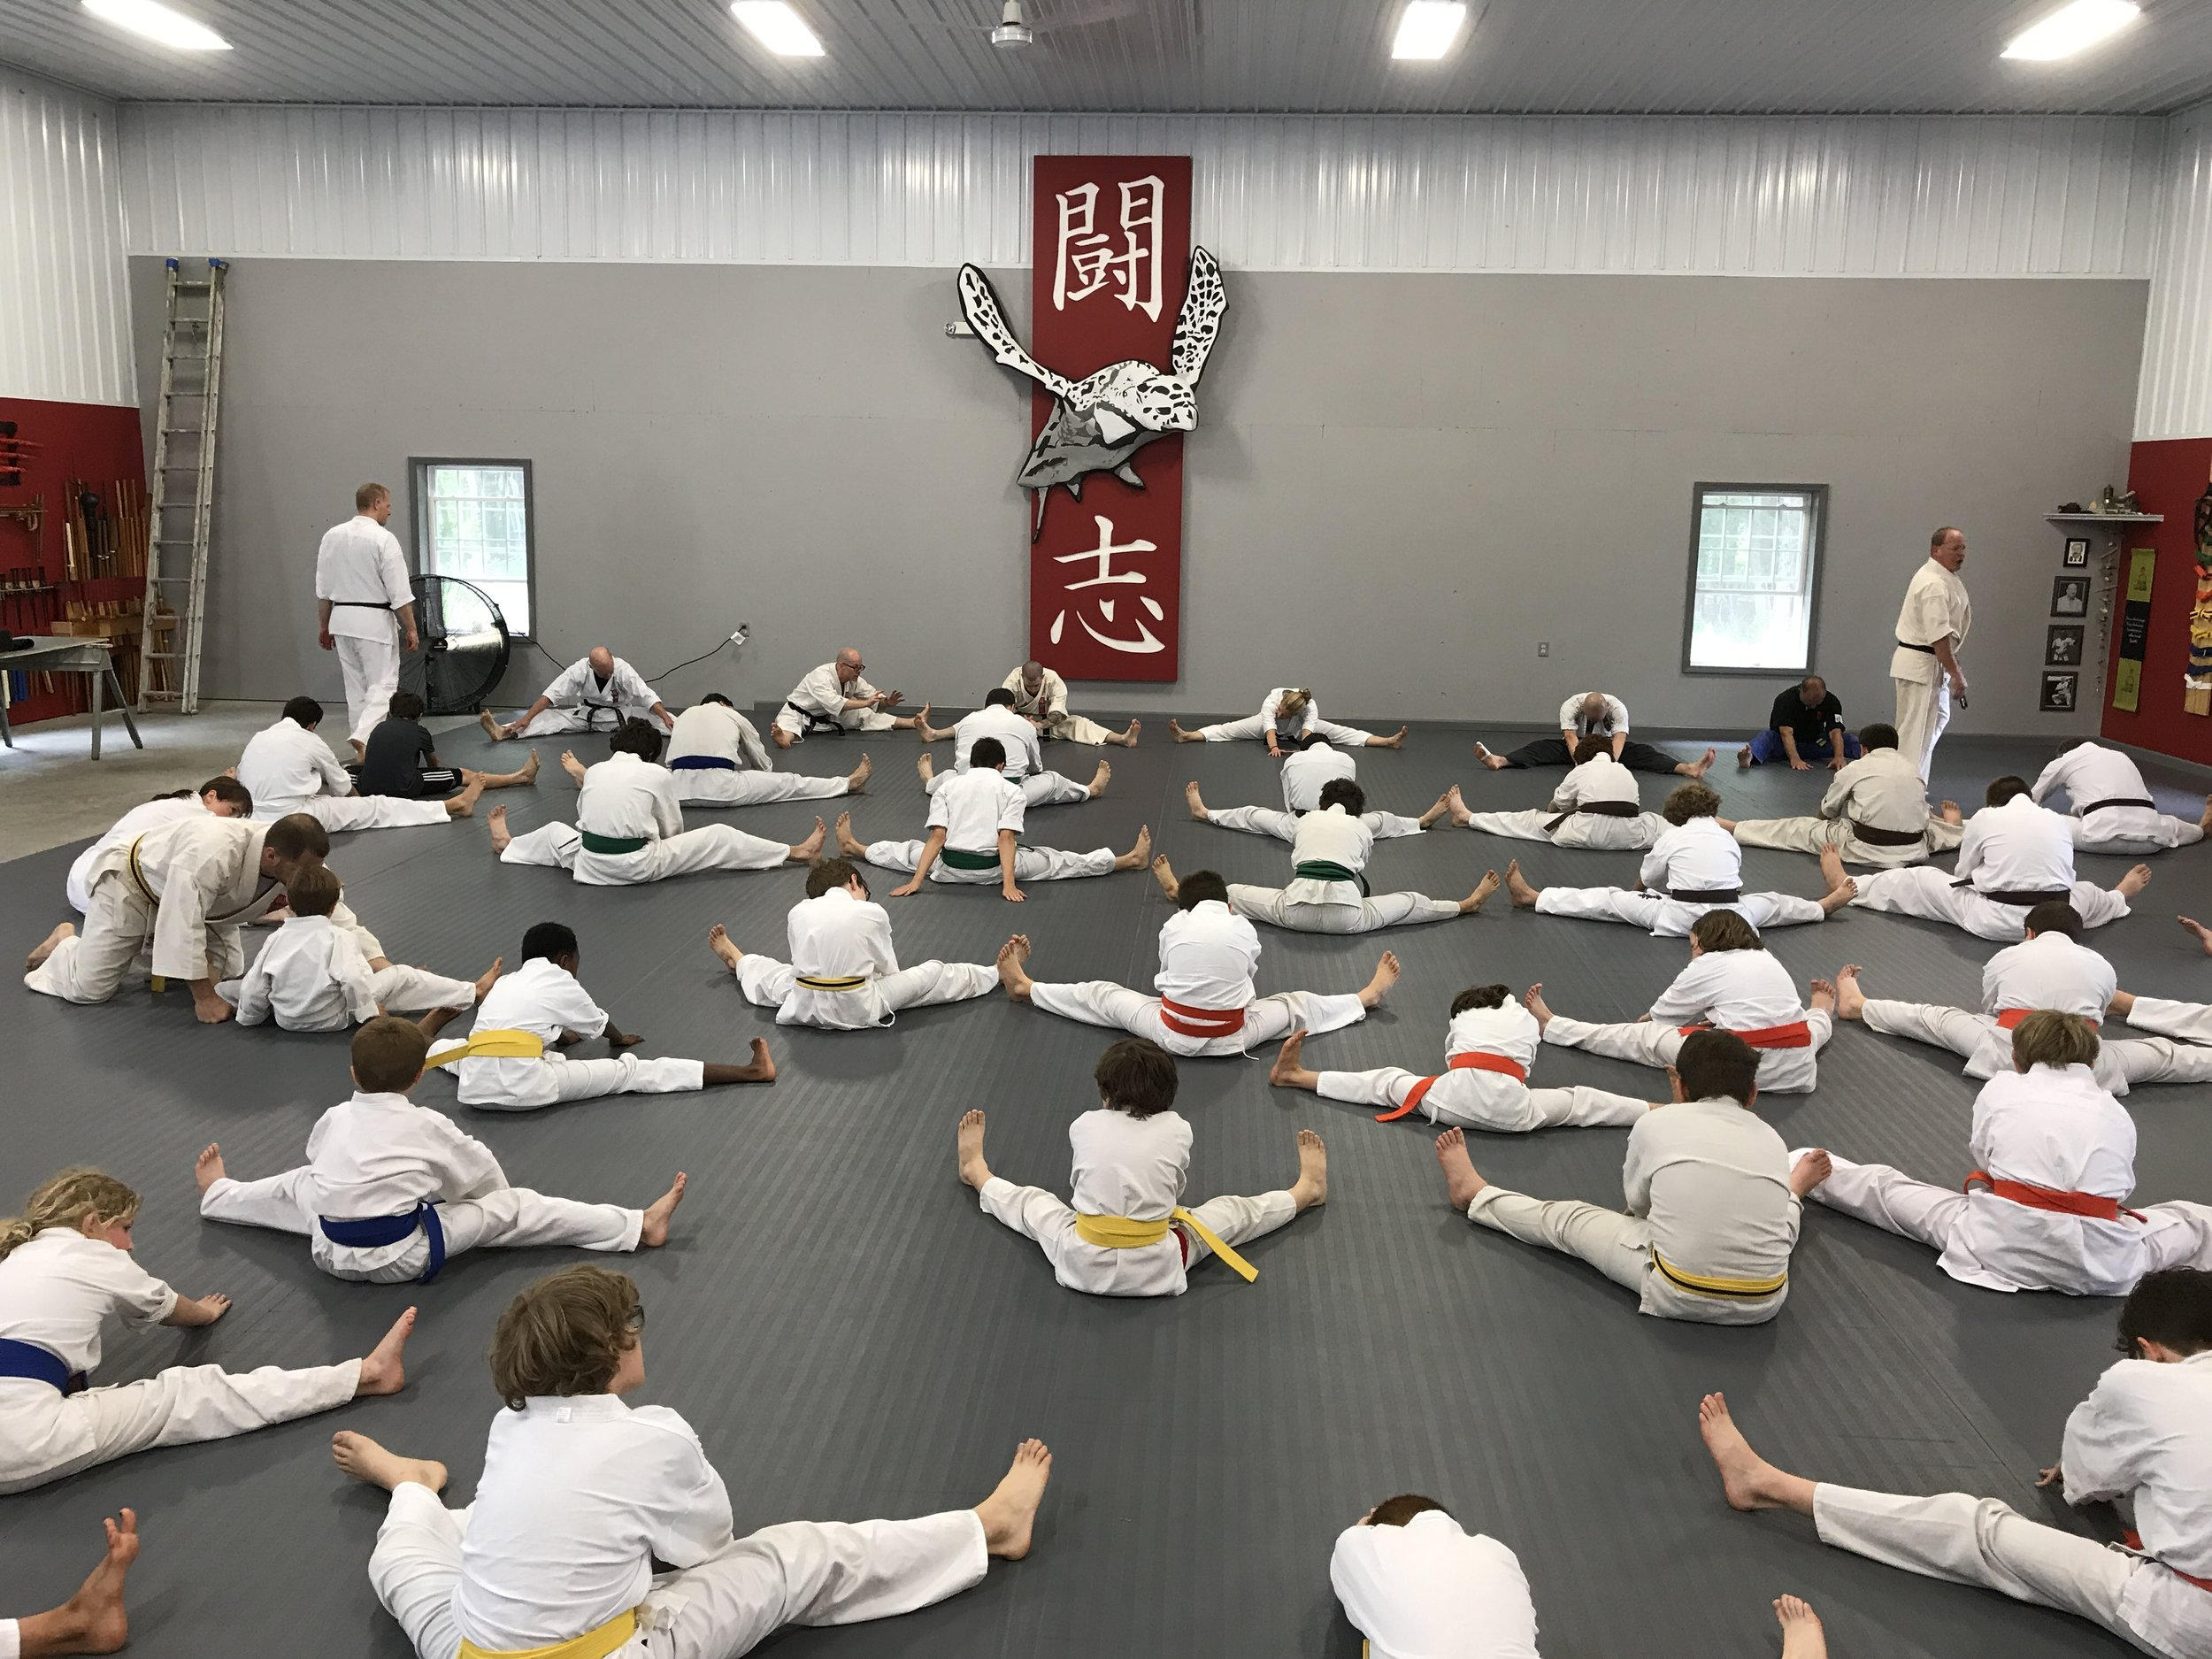 Photo via Fighting Spirit Karate Studio